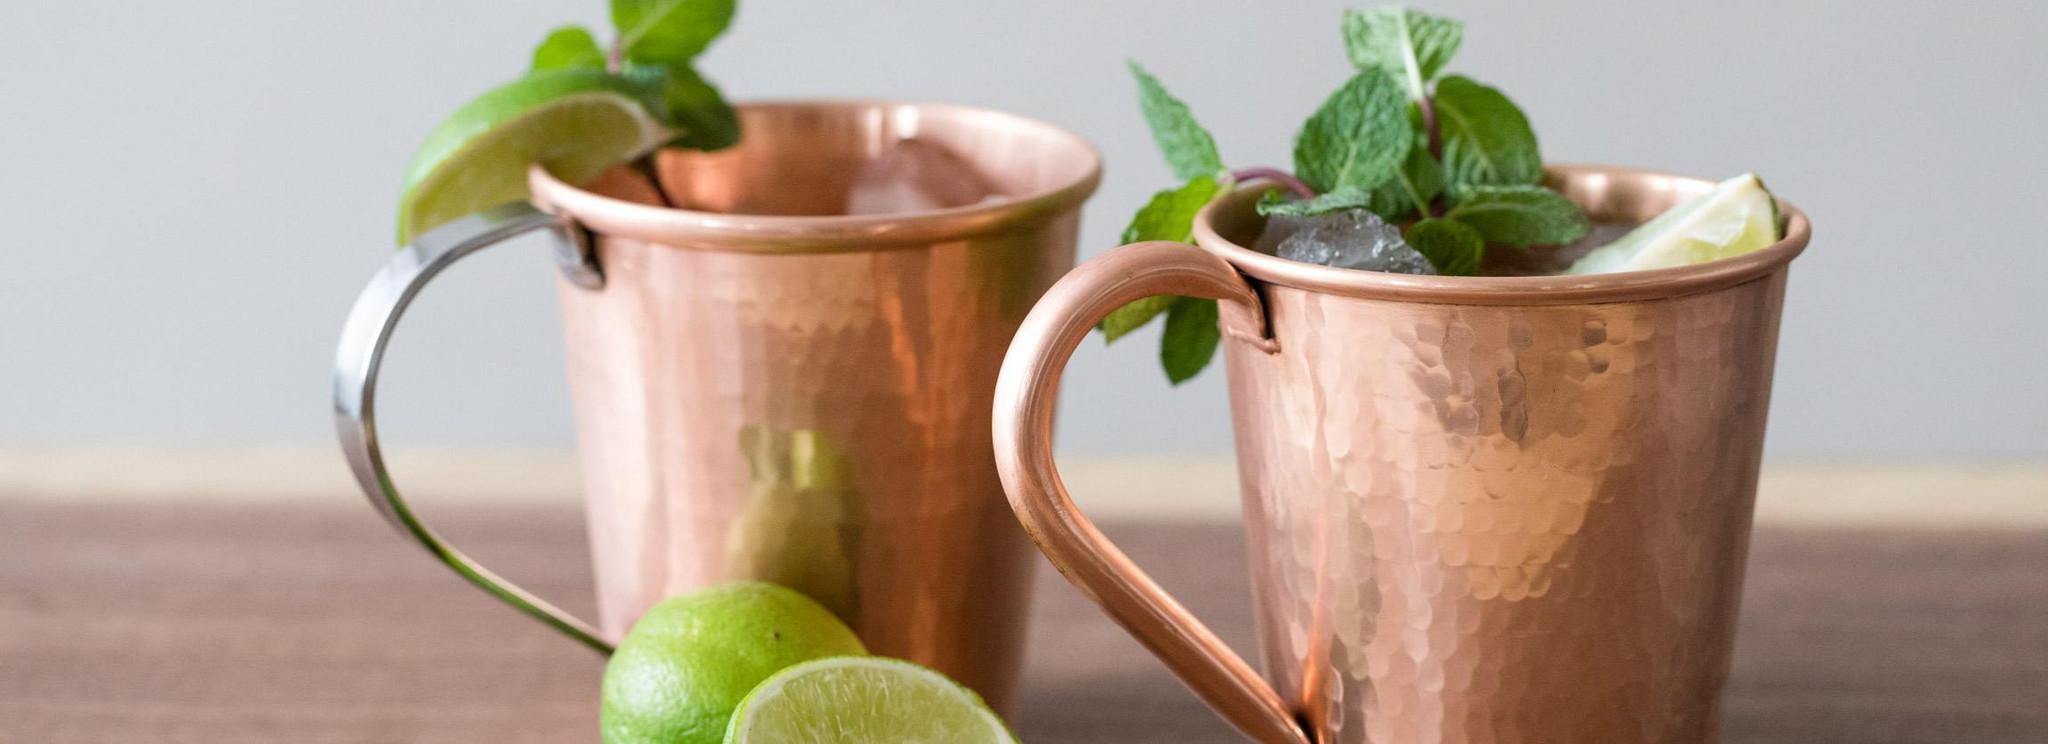 Handmade Copper Moscow Mule Mugs